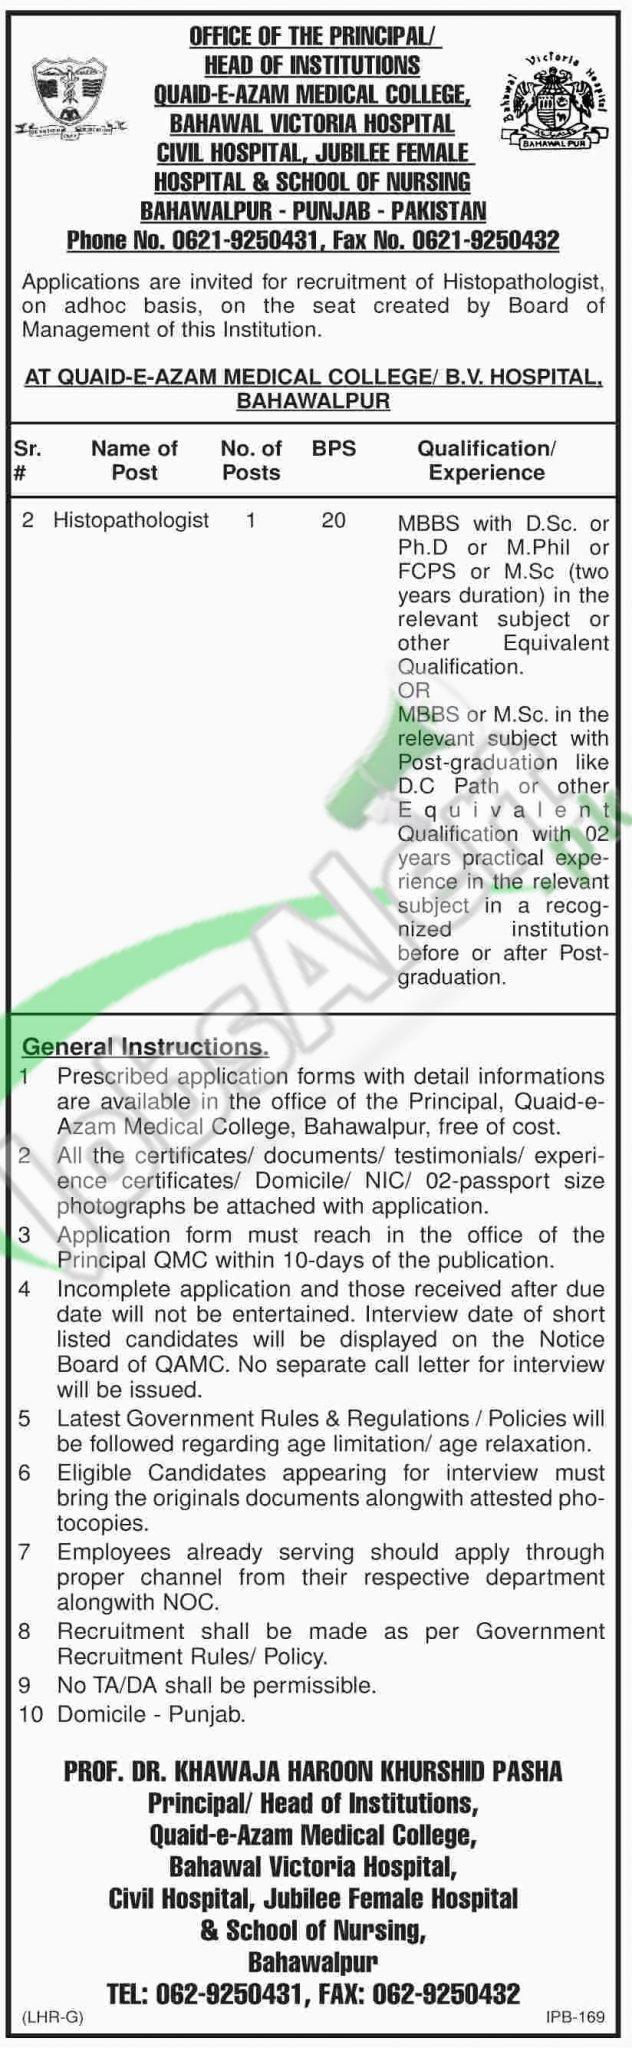 Situatiuons Vacant for Histopathologist in QMC Bahawal Victoria Hospital 25 Feb 2016 in Bahawalpur Latest Advertisement